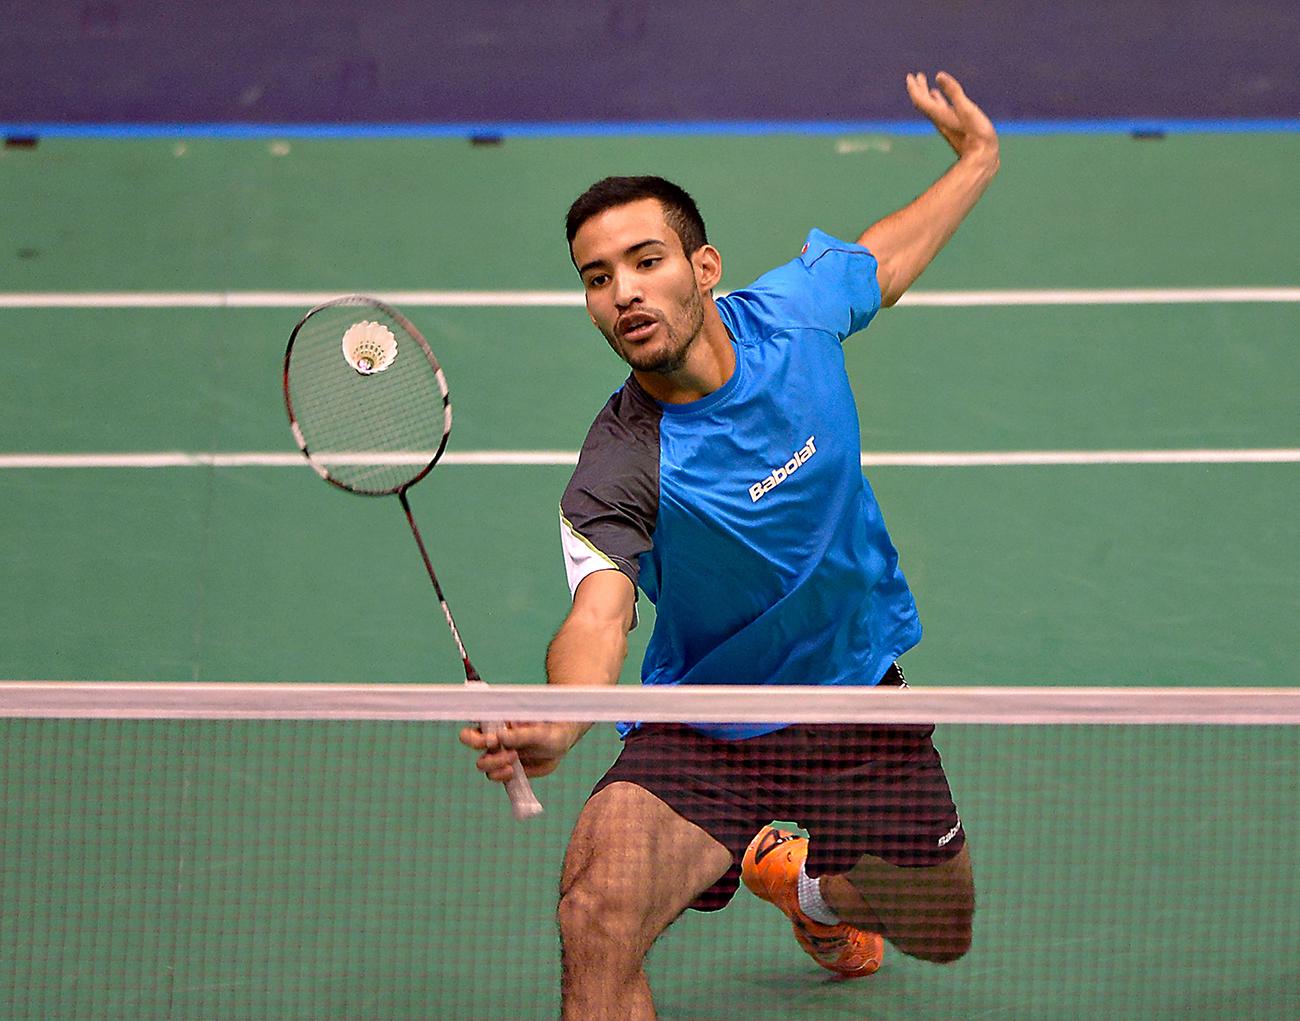 El badmintonista Lino Muñoz afina detalles rumbo a Barranquilla 2018